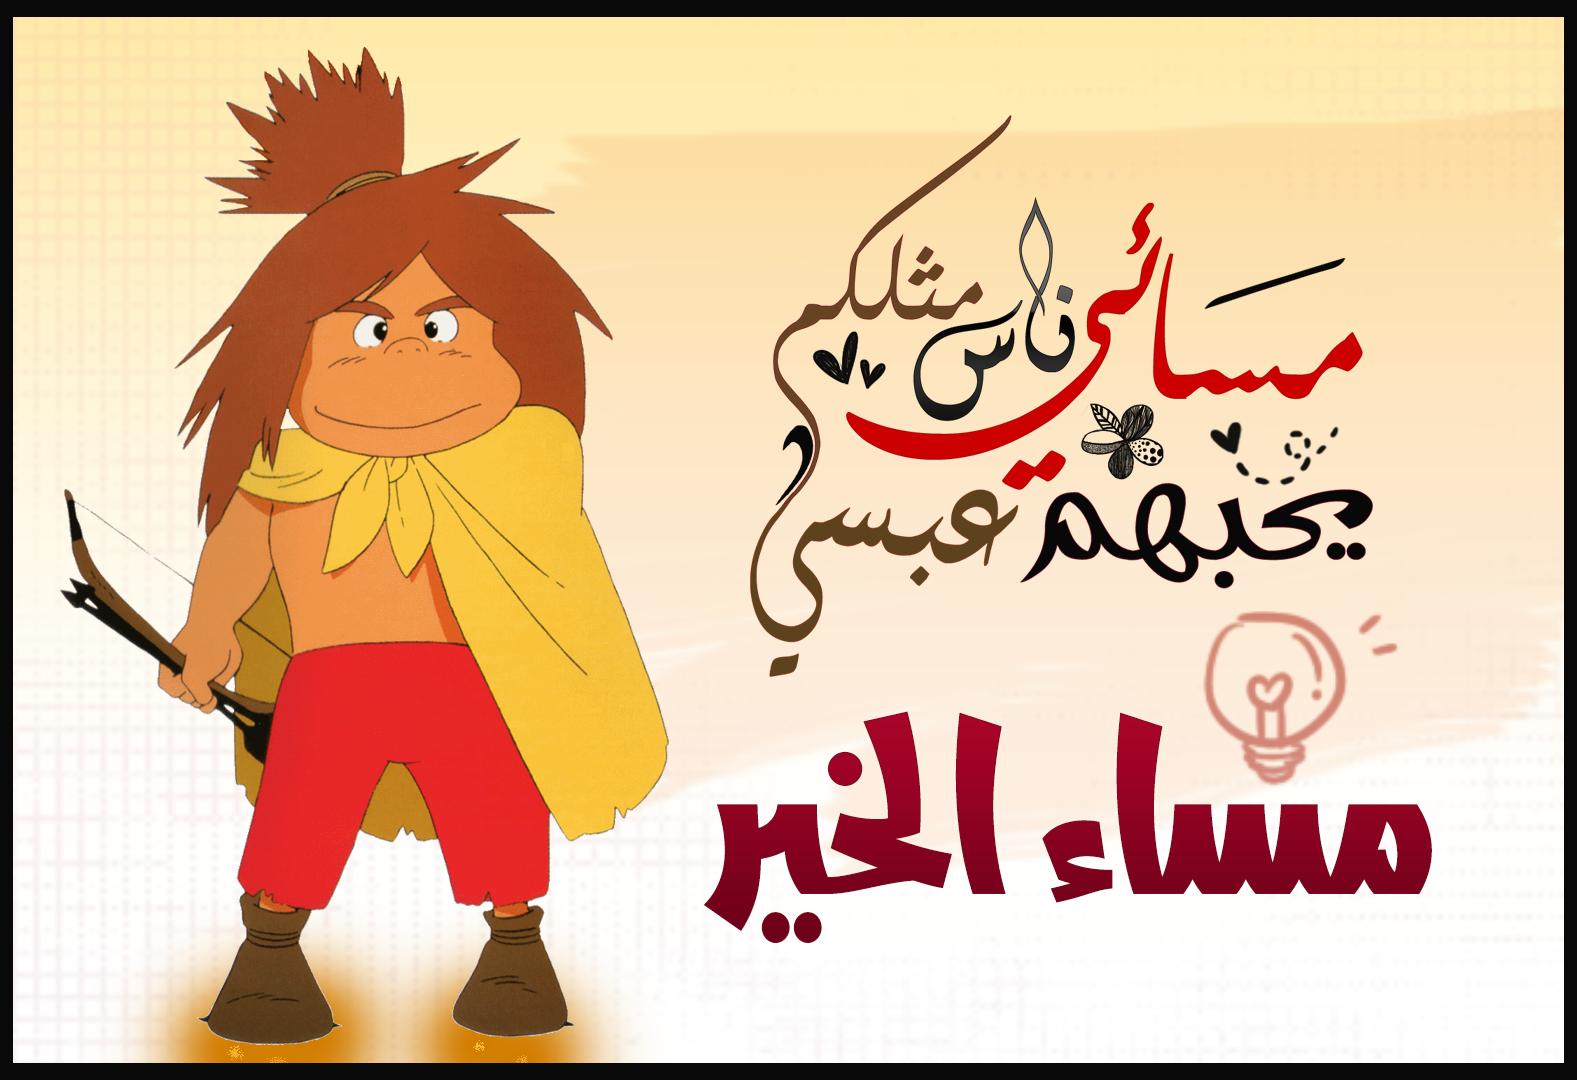 هيما قلبي Beautiful Arabic Words Love Quotes Arabic Love Quotes